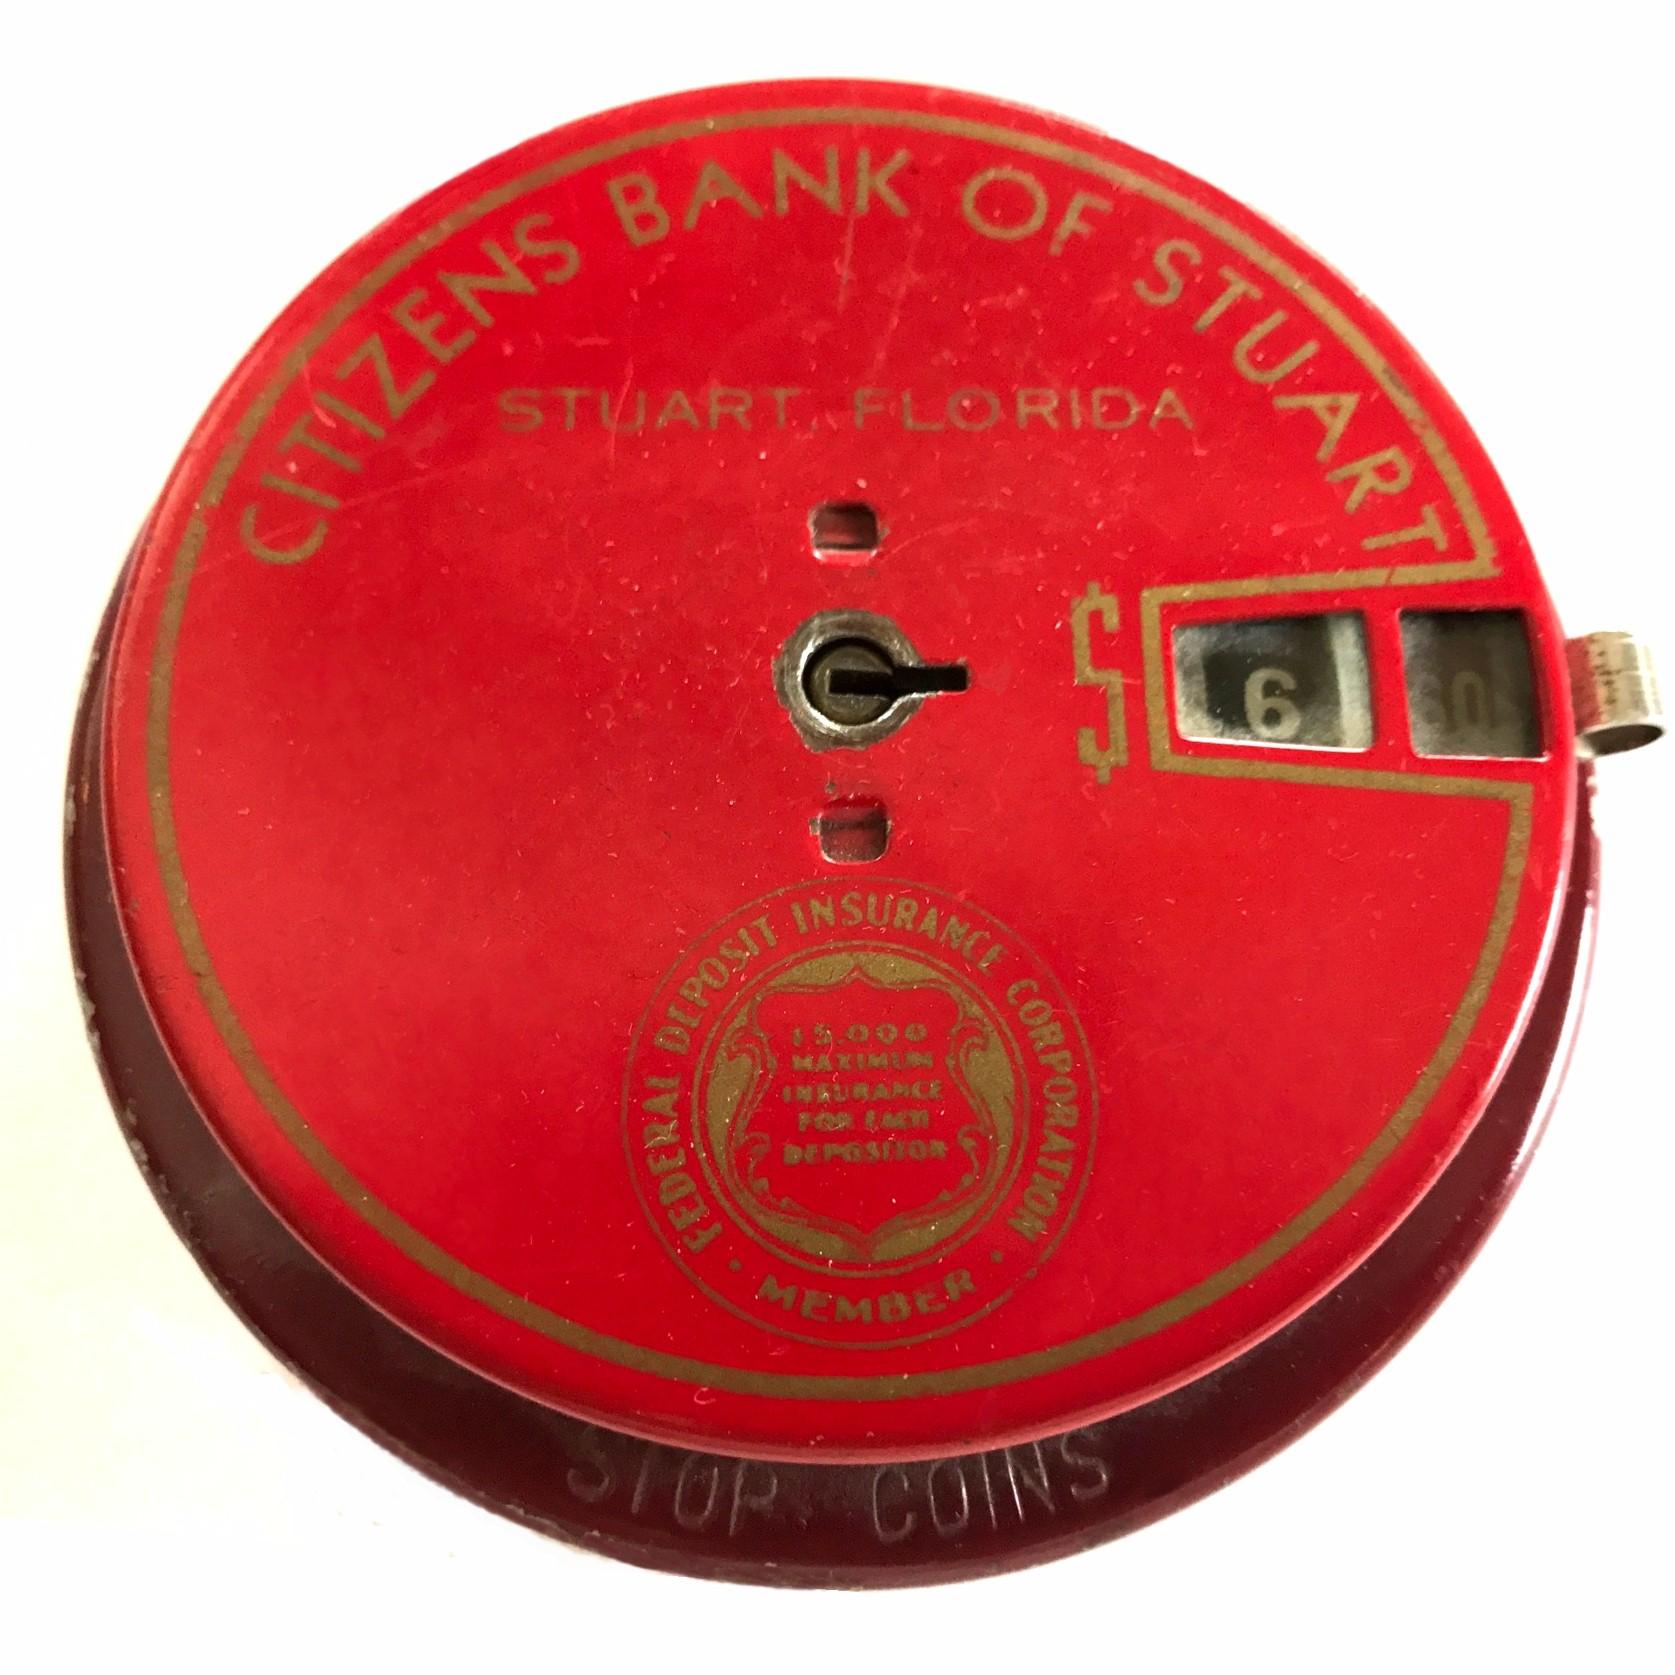 add-o-bank - (1948)-red--Luckhardt copy